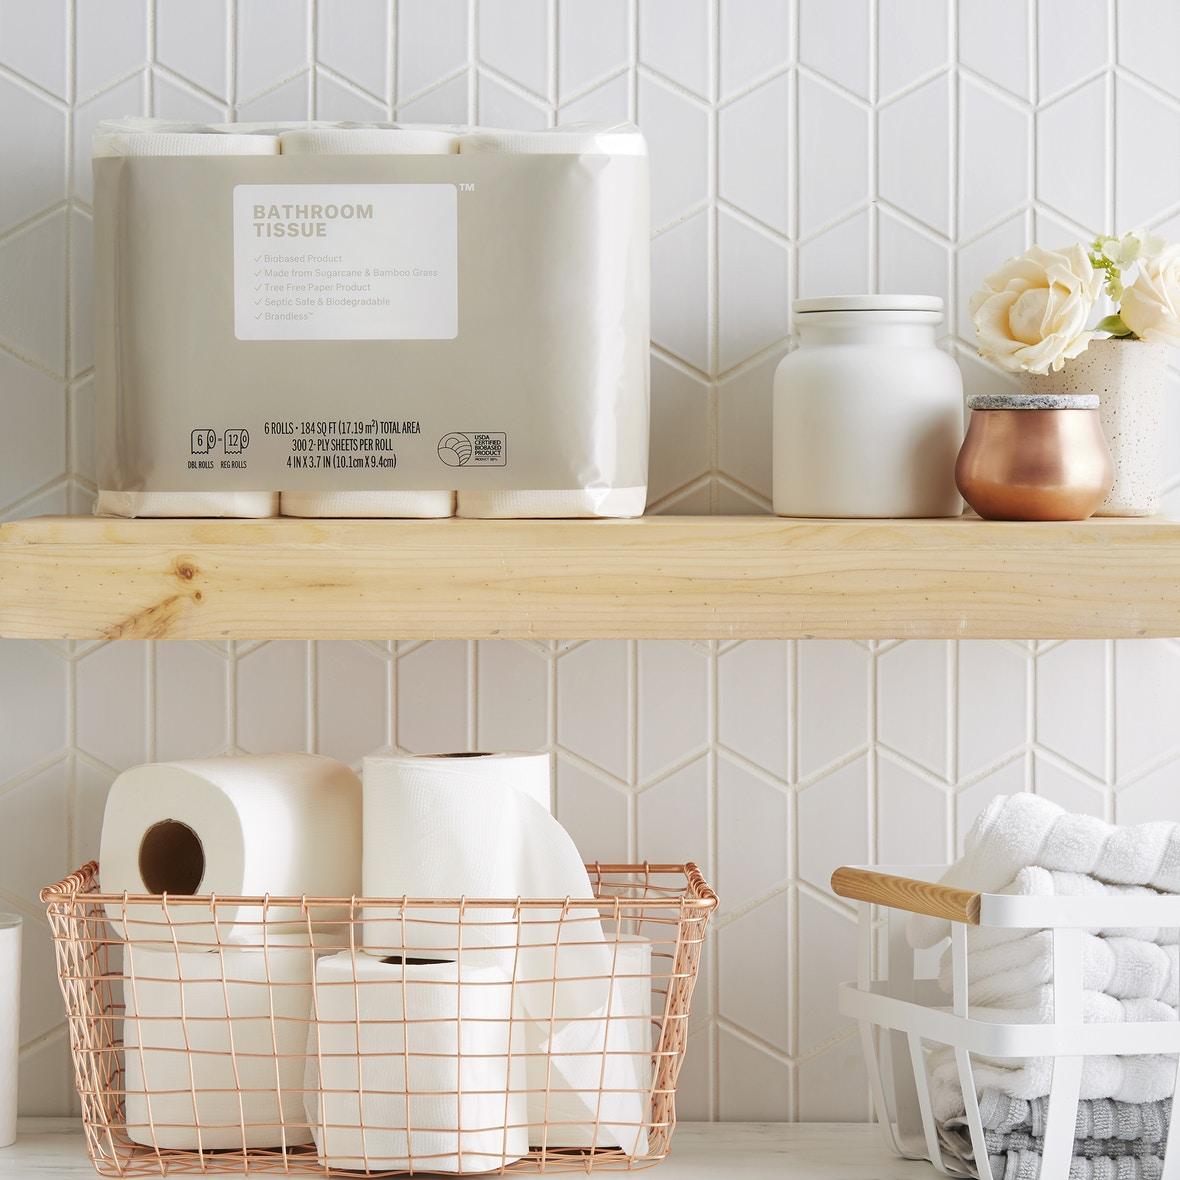 Brandless Toilet Paper.jpg